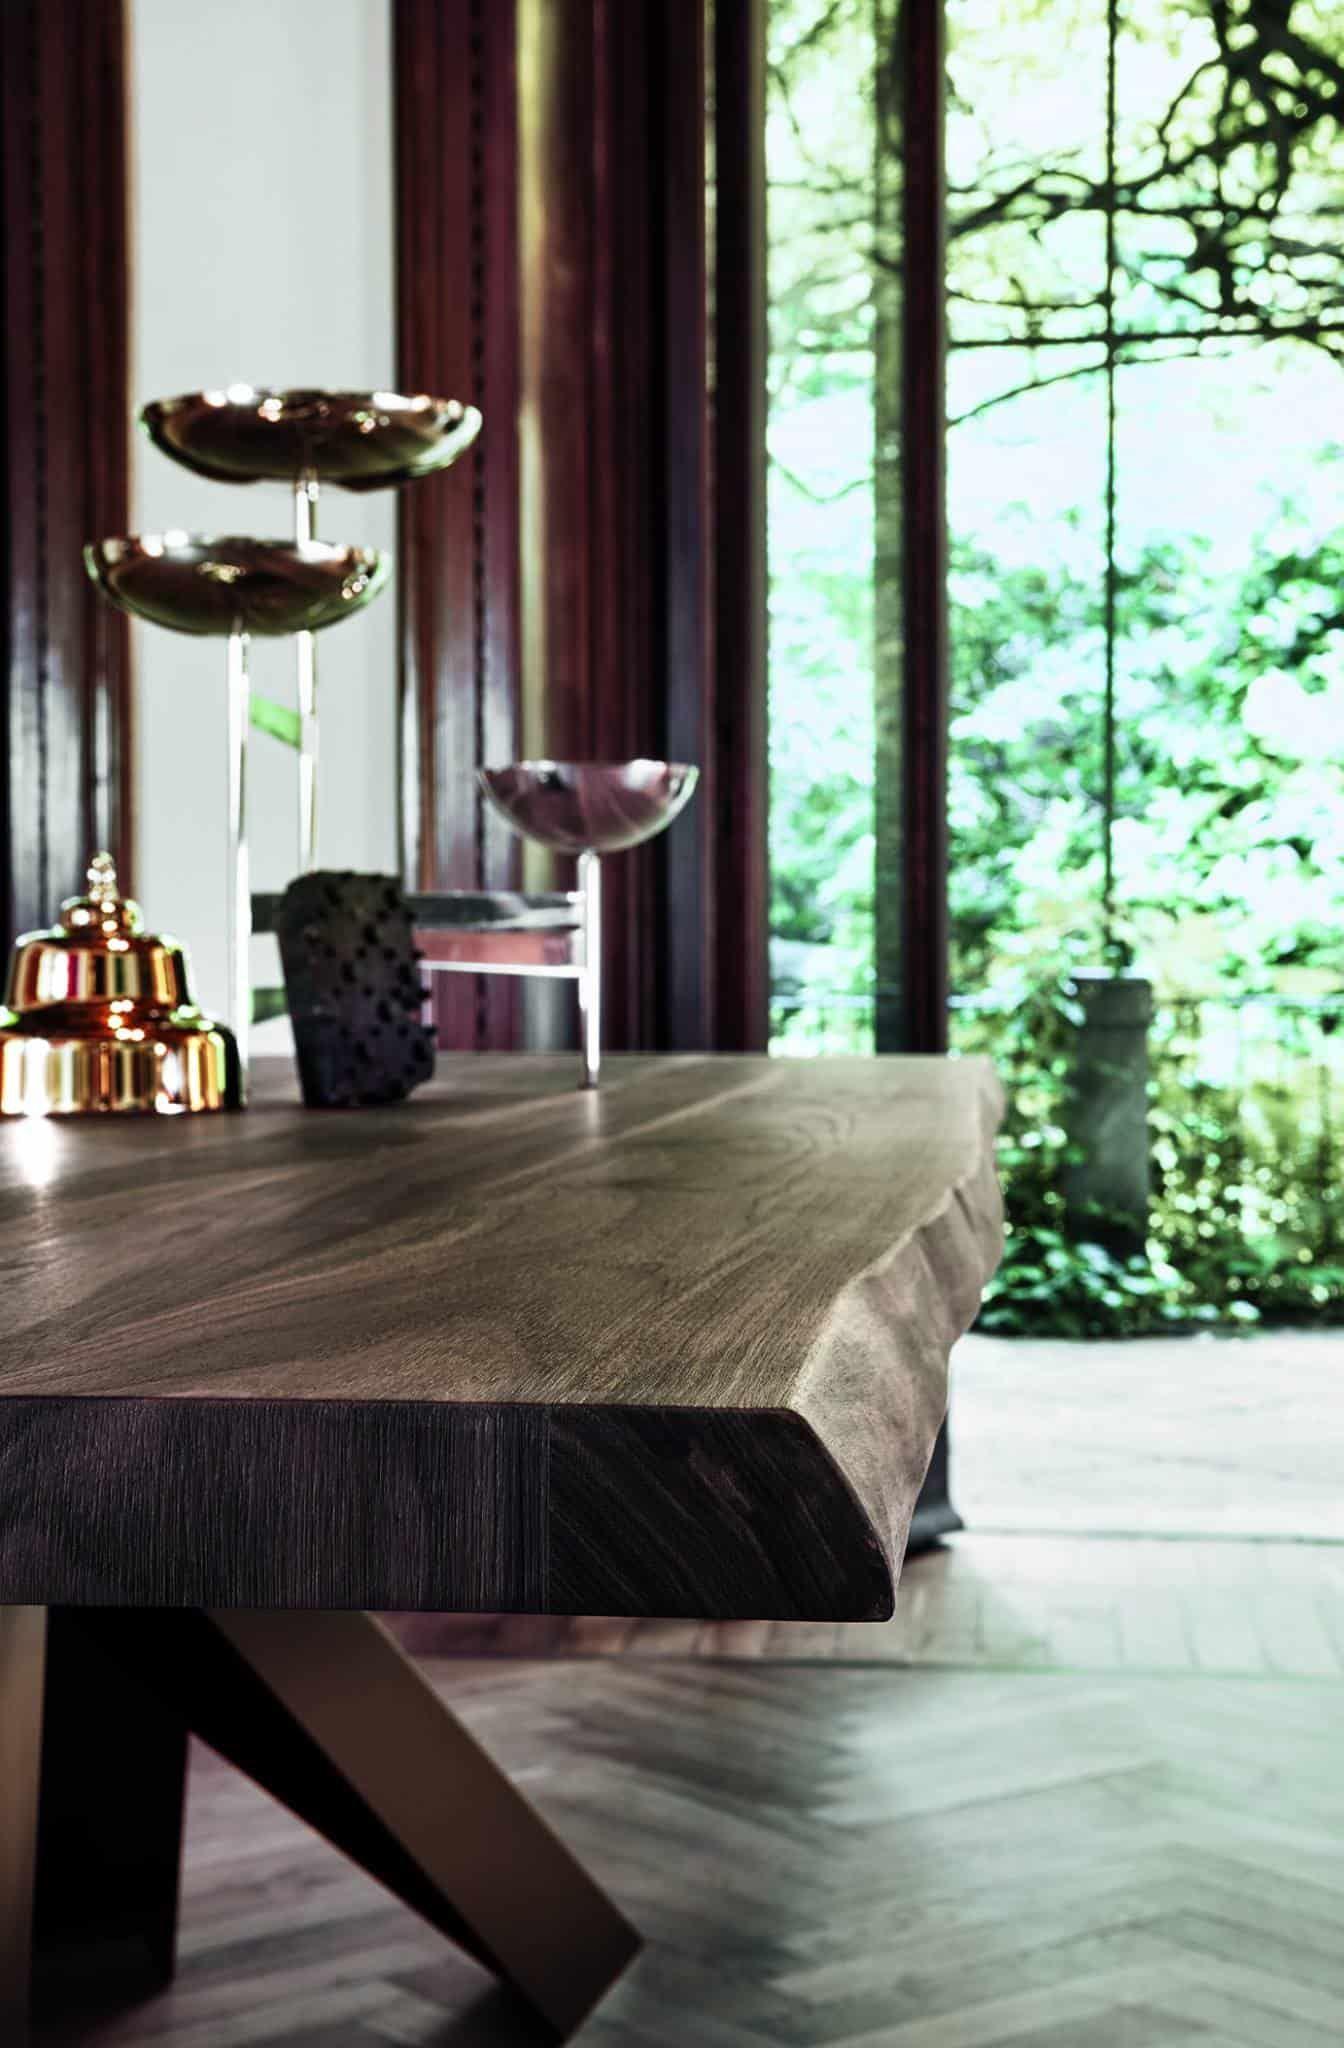 Big Table Bonaldo Allungabile.Bonaldo Details That Make The Difference Big Table Design Alain